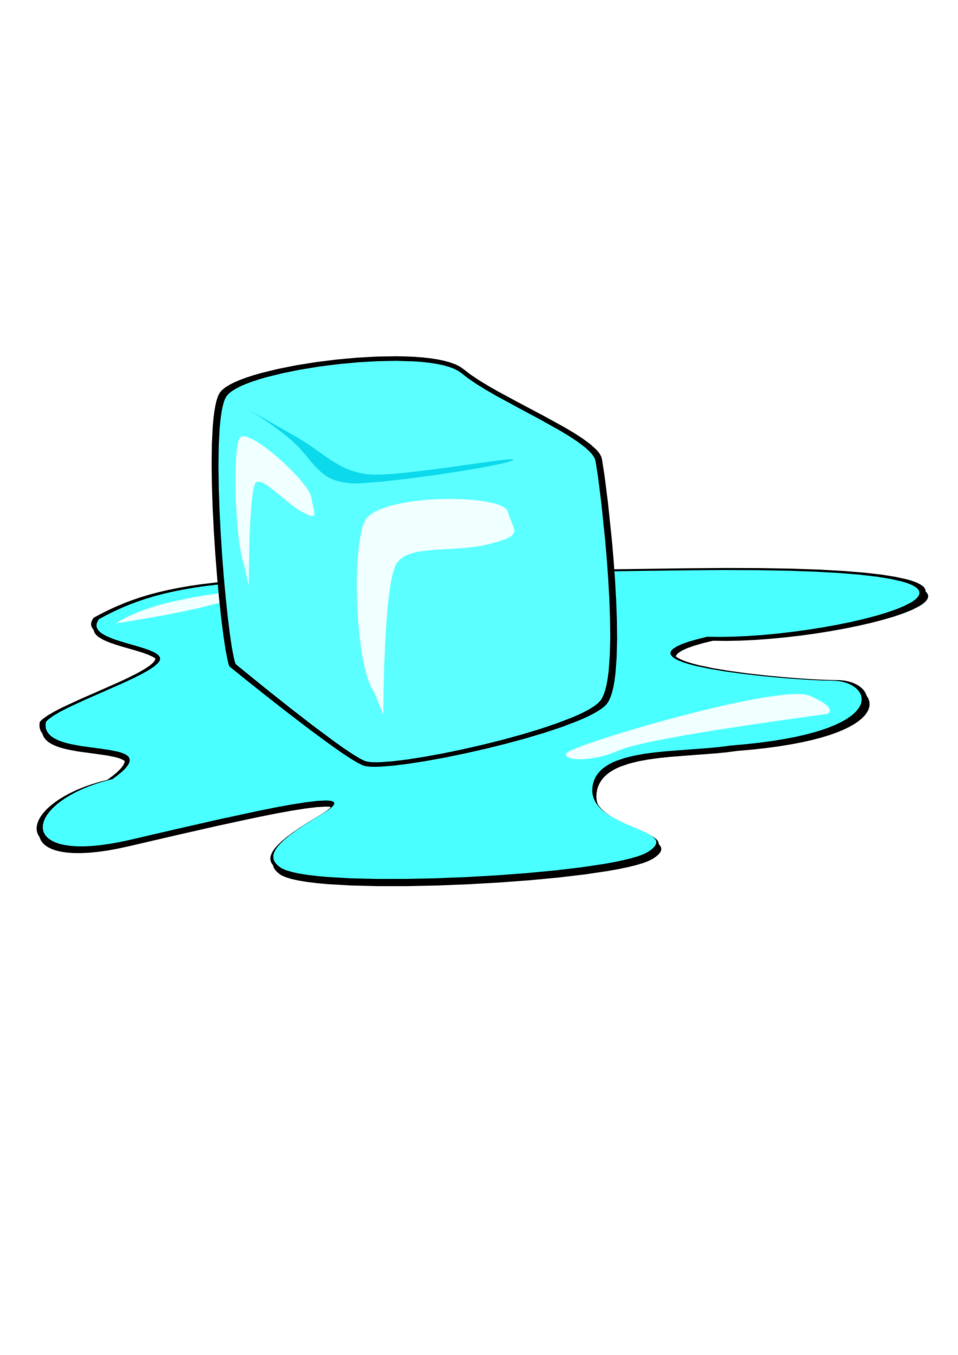 public domain clip art image ice cube id